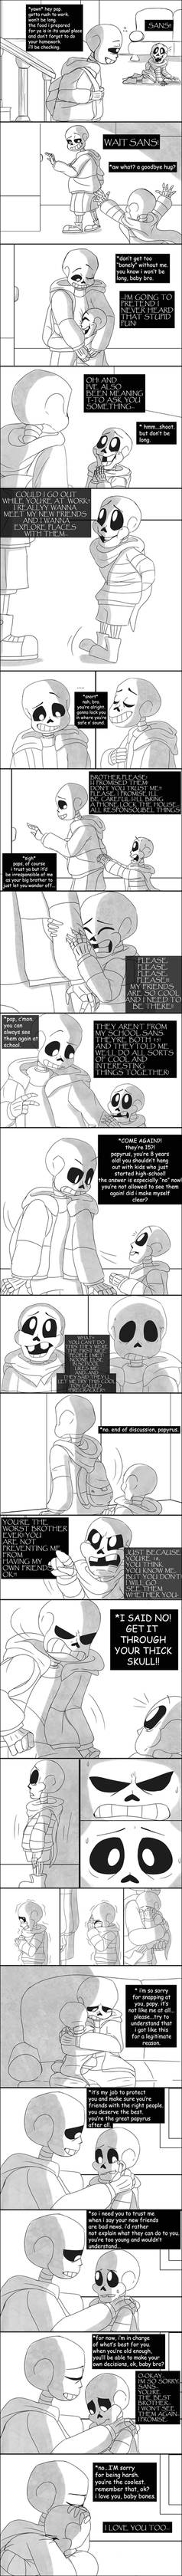 You don't understand yet (babybones comic)